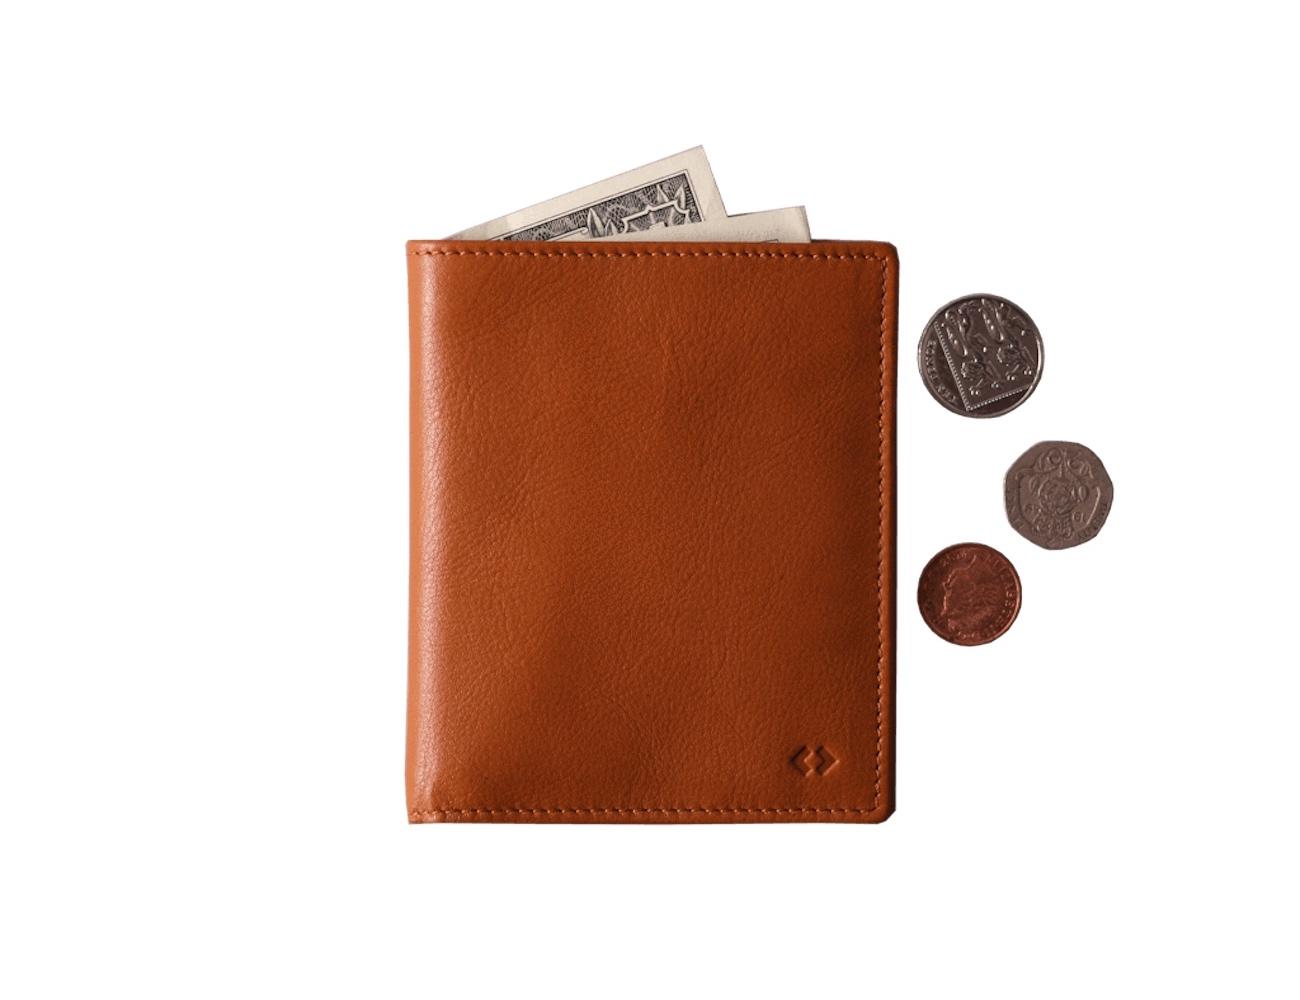 Harber London Leather Bifold RFID Blocking Wallet